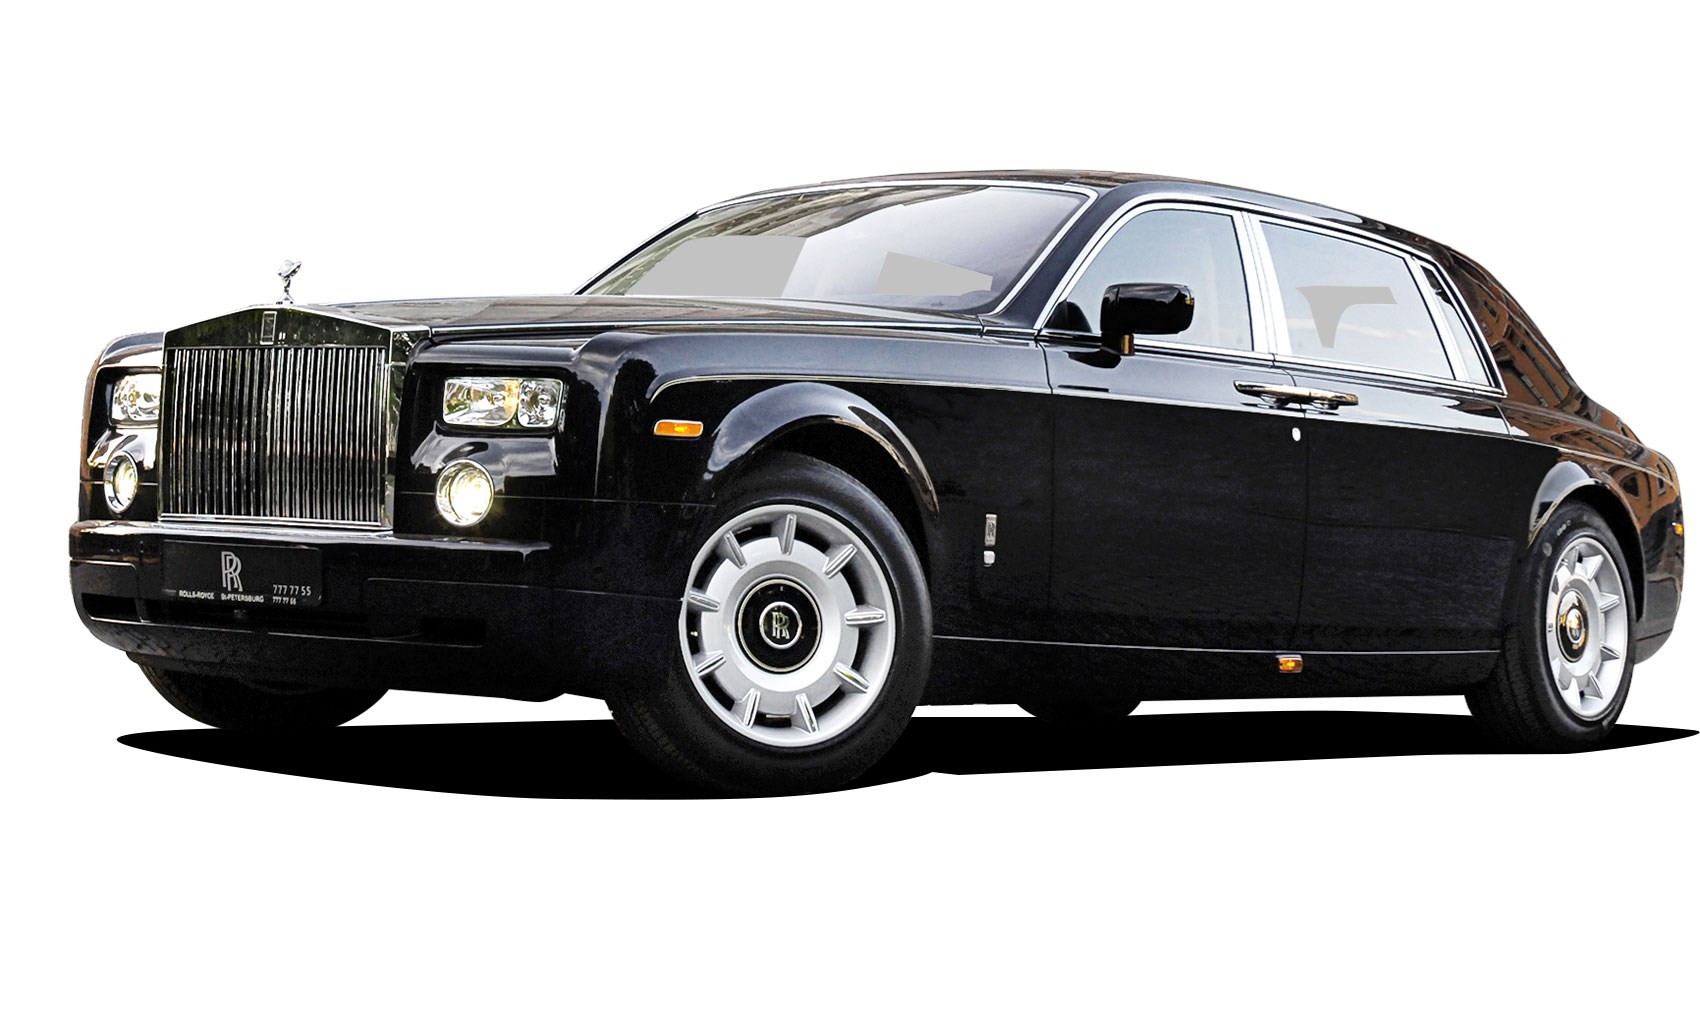 icon buyer: how to buy a used rolls-royce phantom, car+ january 2016